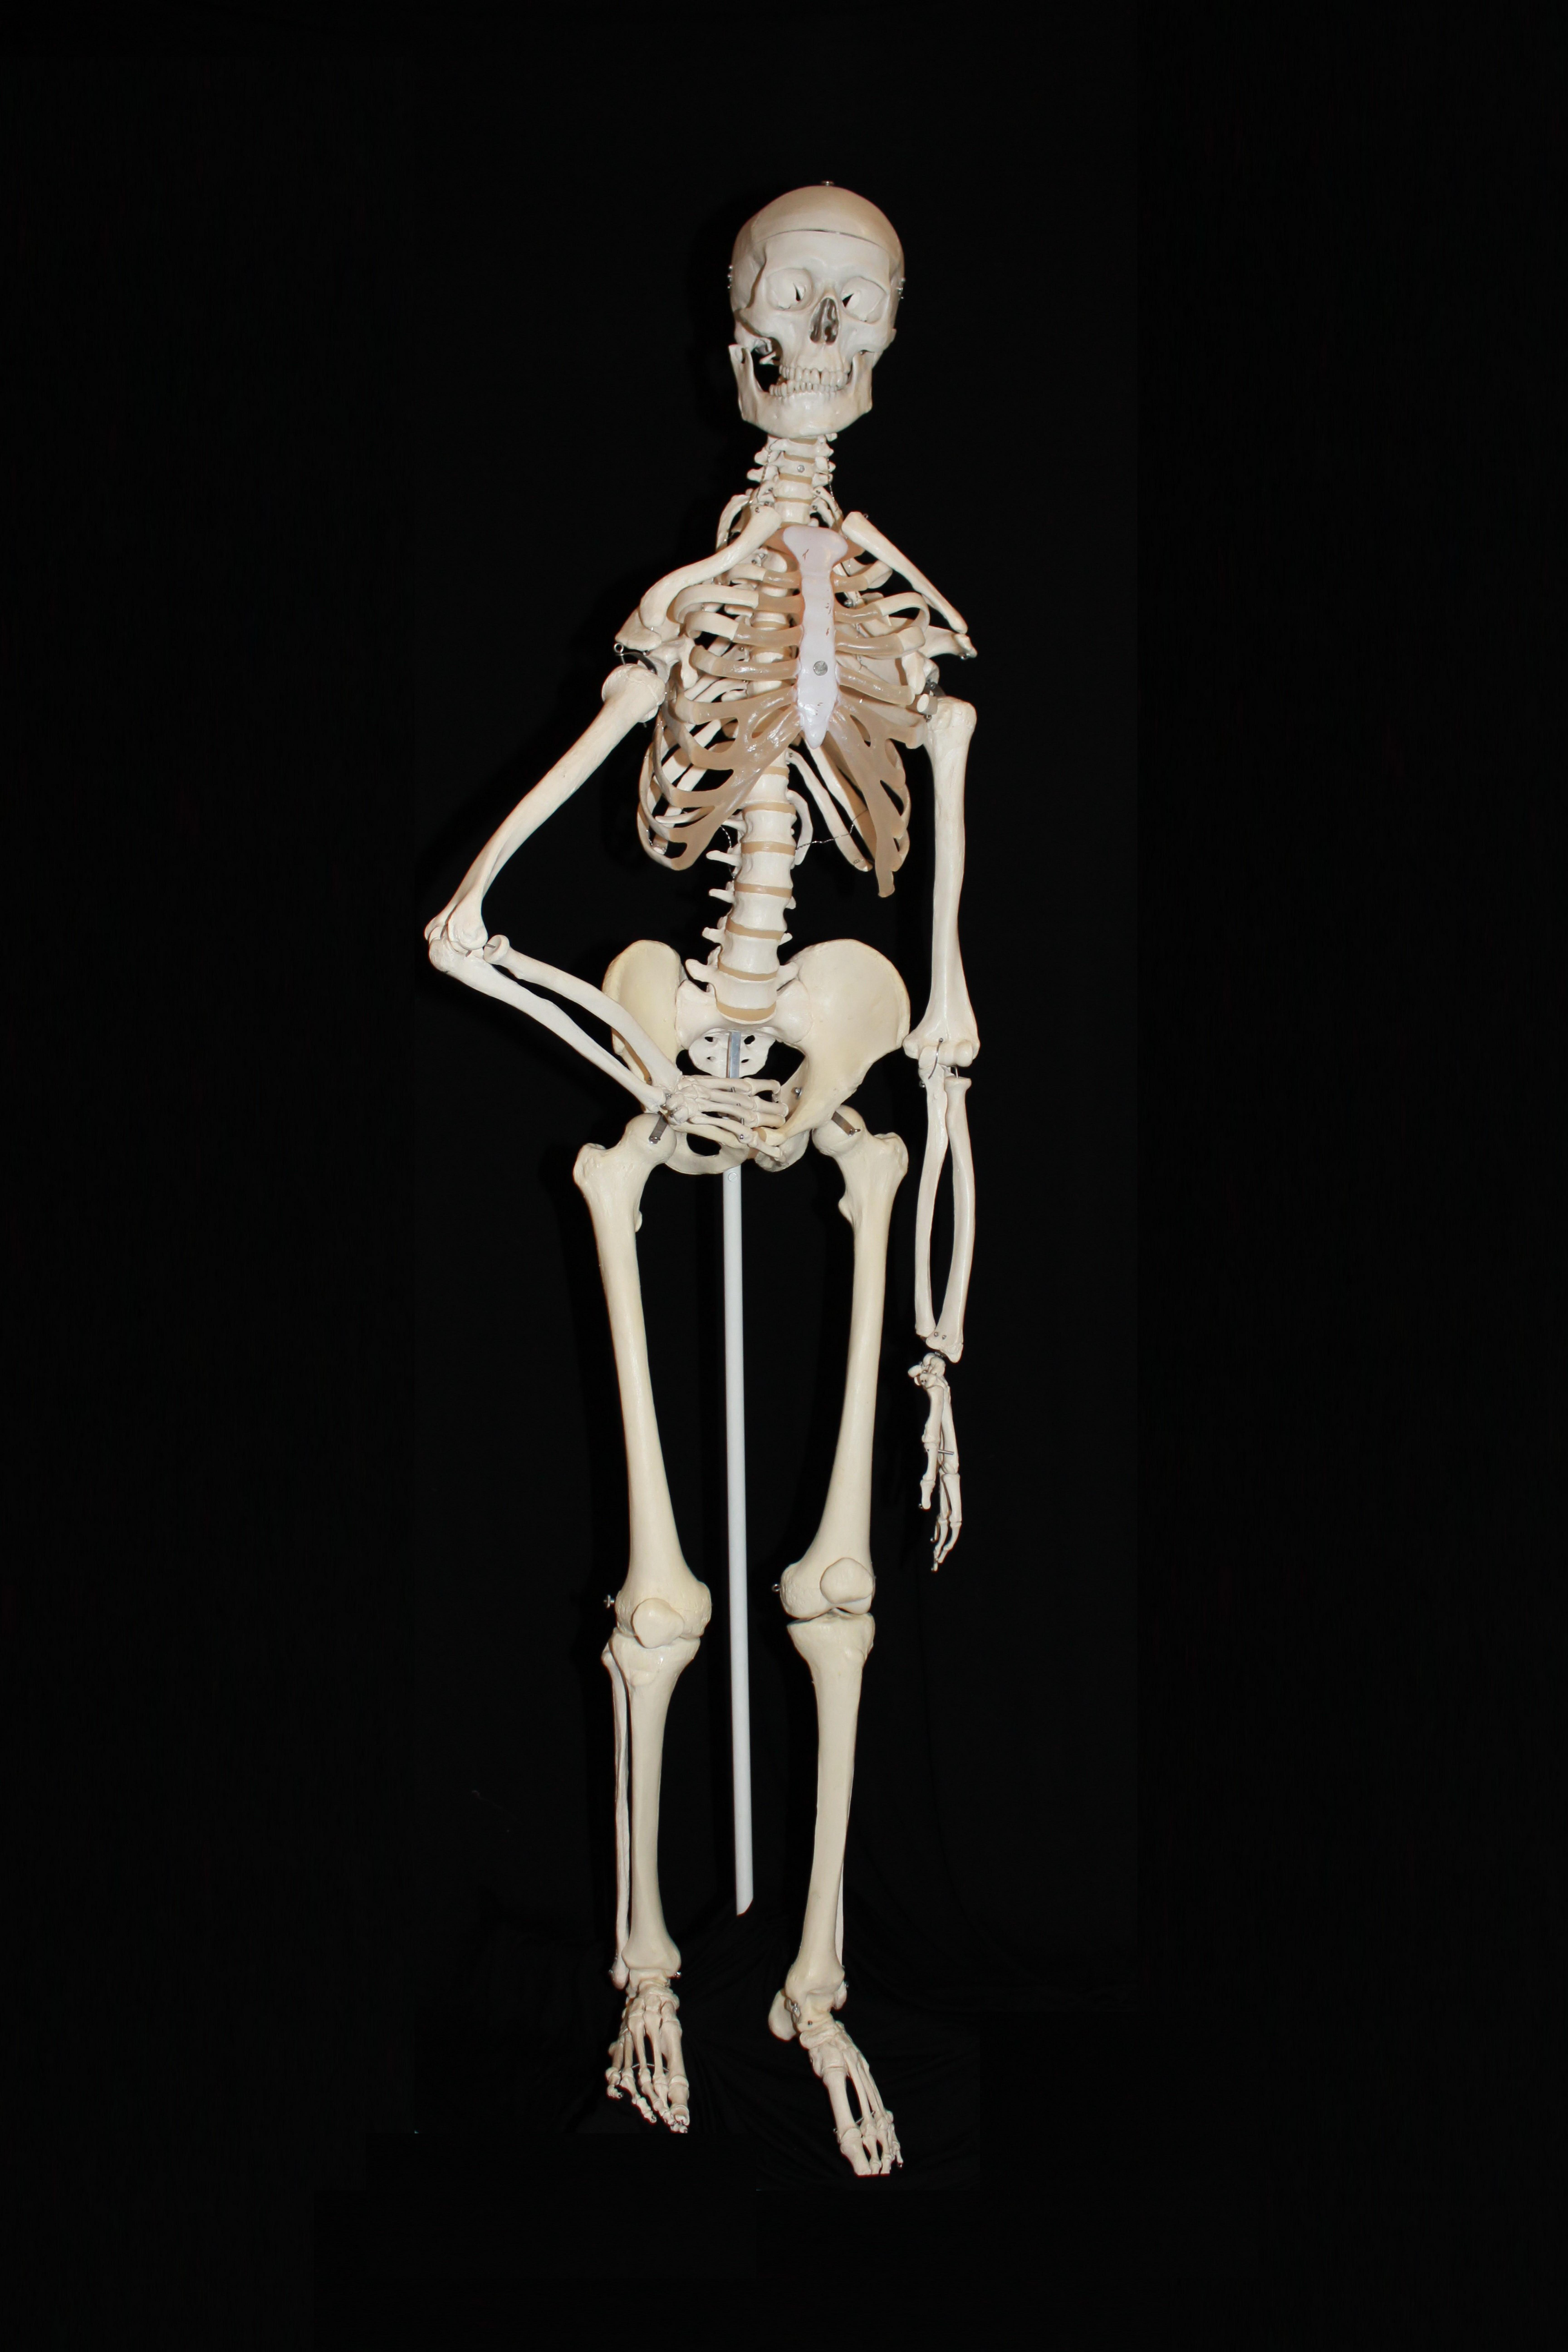 Free Images Arm Bone Human Body Human Anatomy Illustration